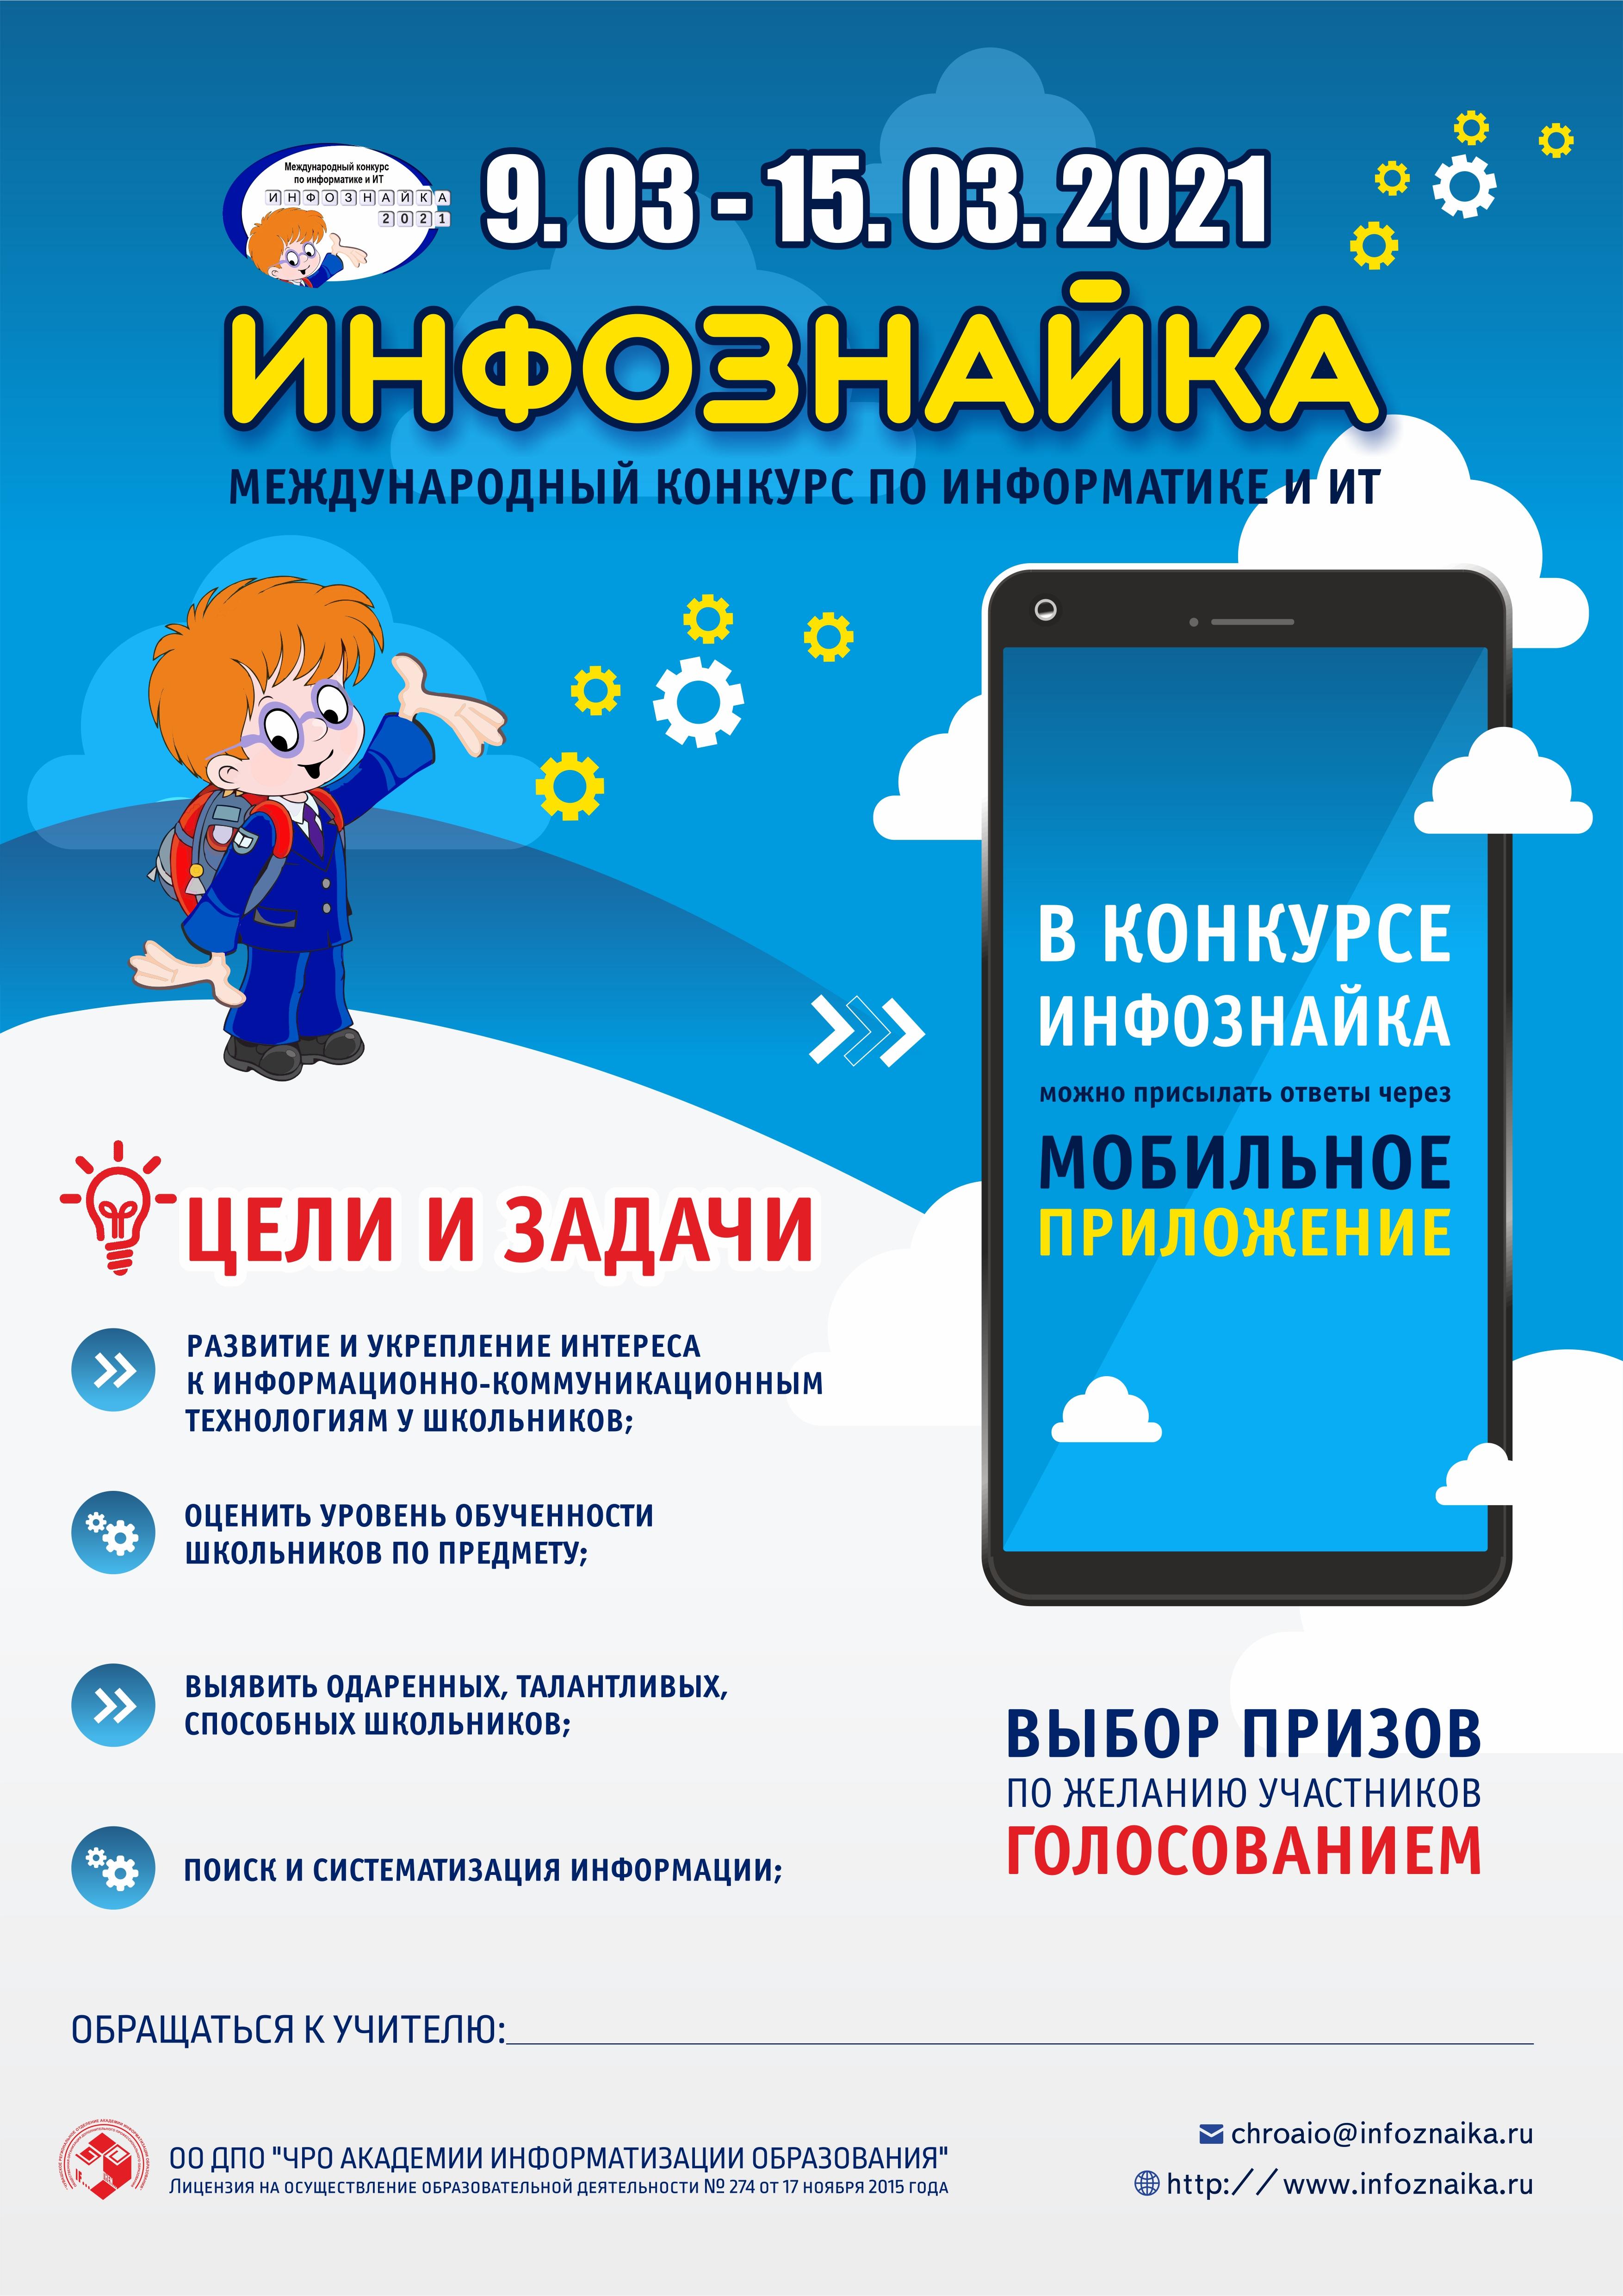 Афиша конкурса Инфознайка